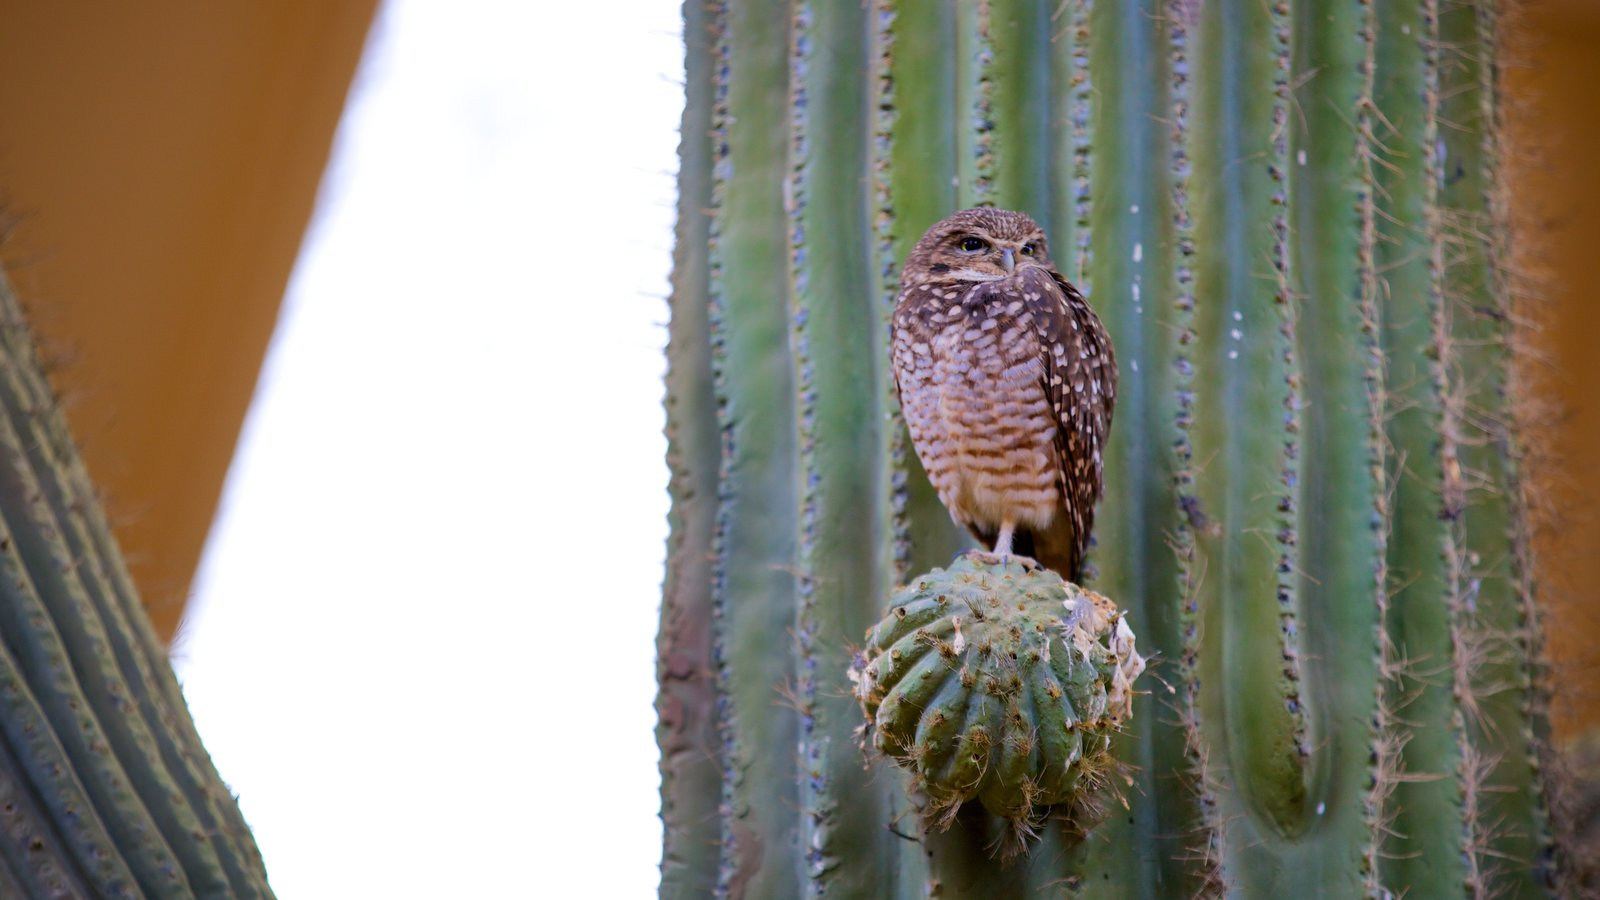 ZooAmerica que inclui vida das aves e animais de zoológico